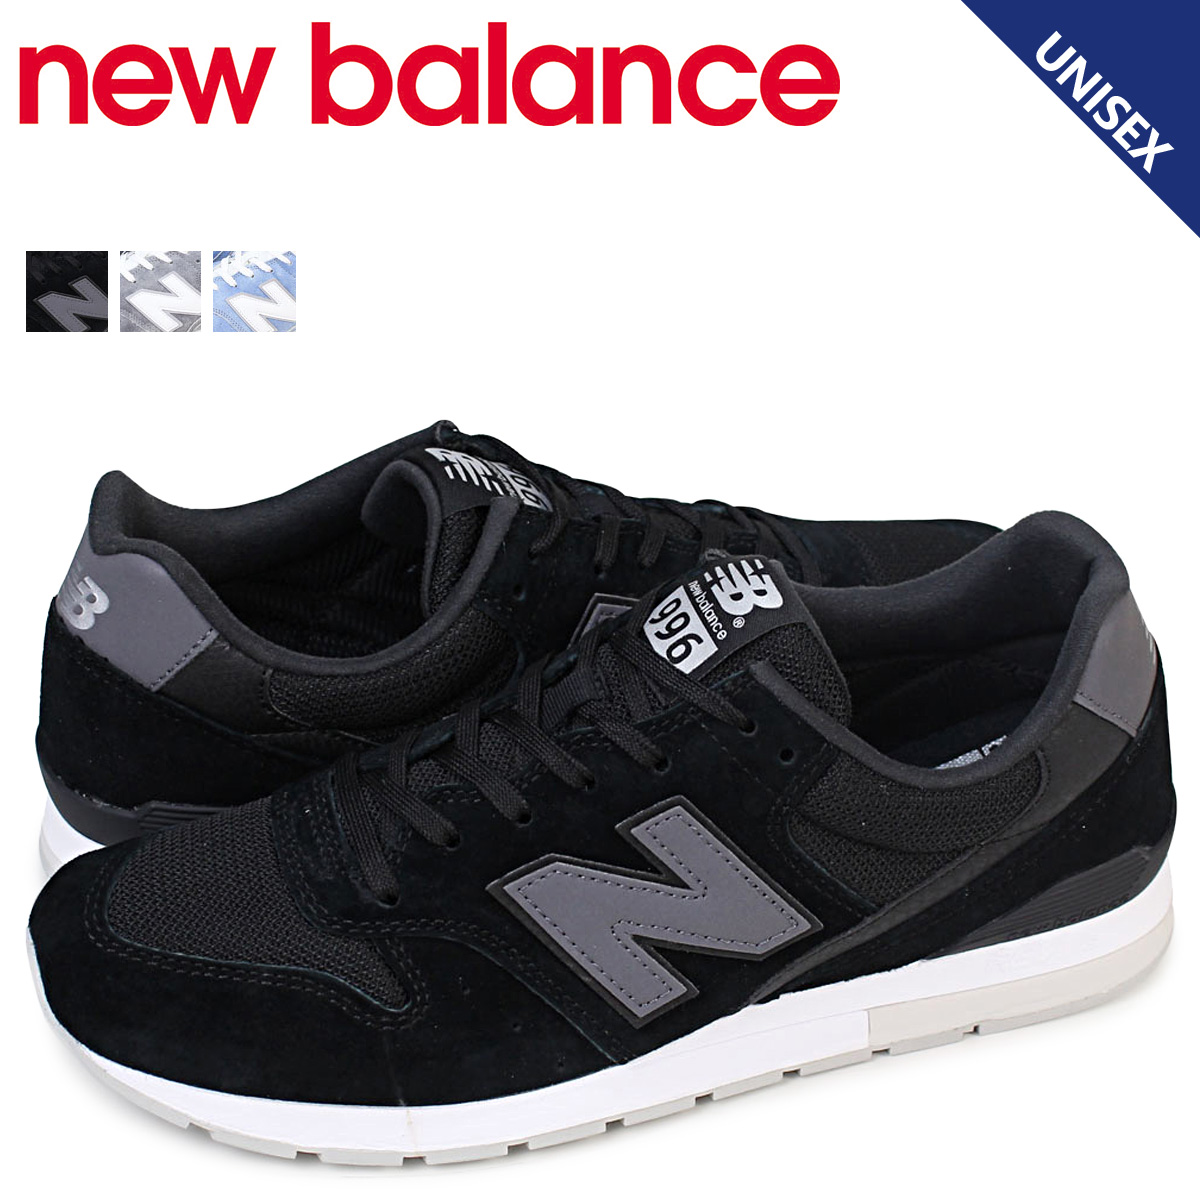 new balance 996 メンズ レディース ニューバランス スニーカー MRL996JN MRL996JU MRL996JX Dワイズ 靴